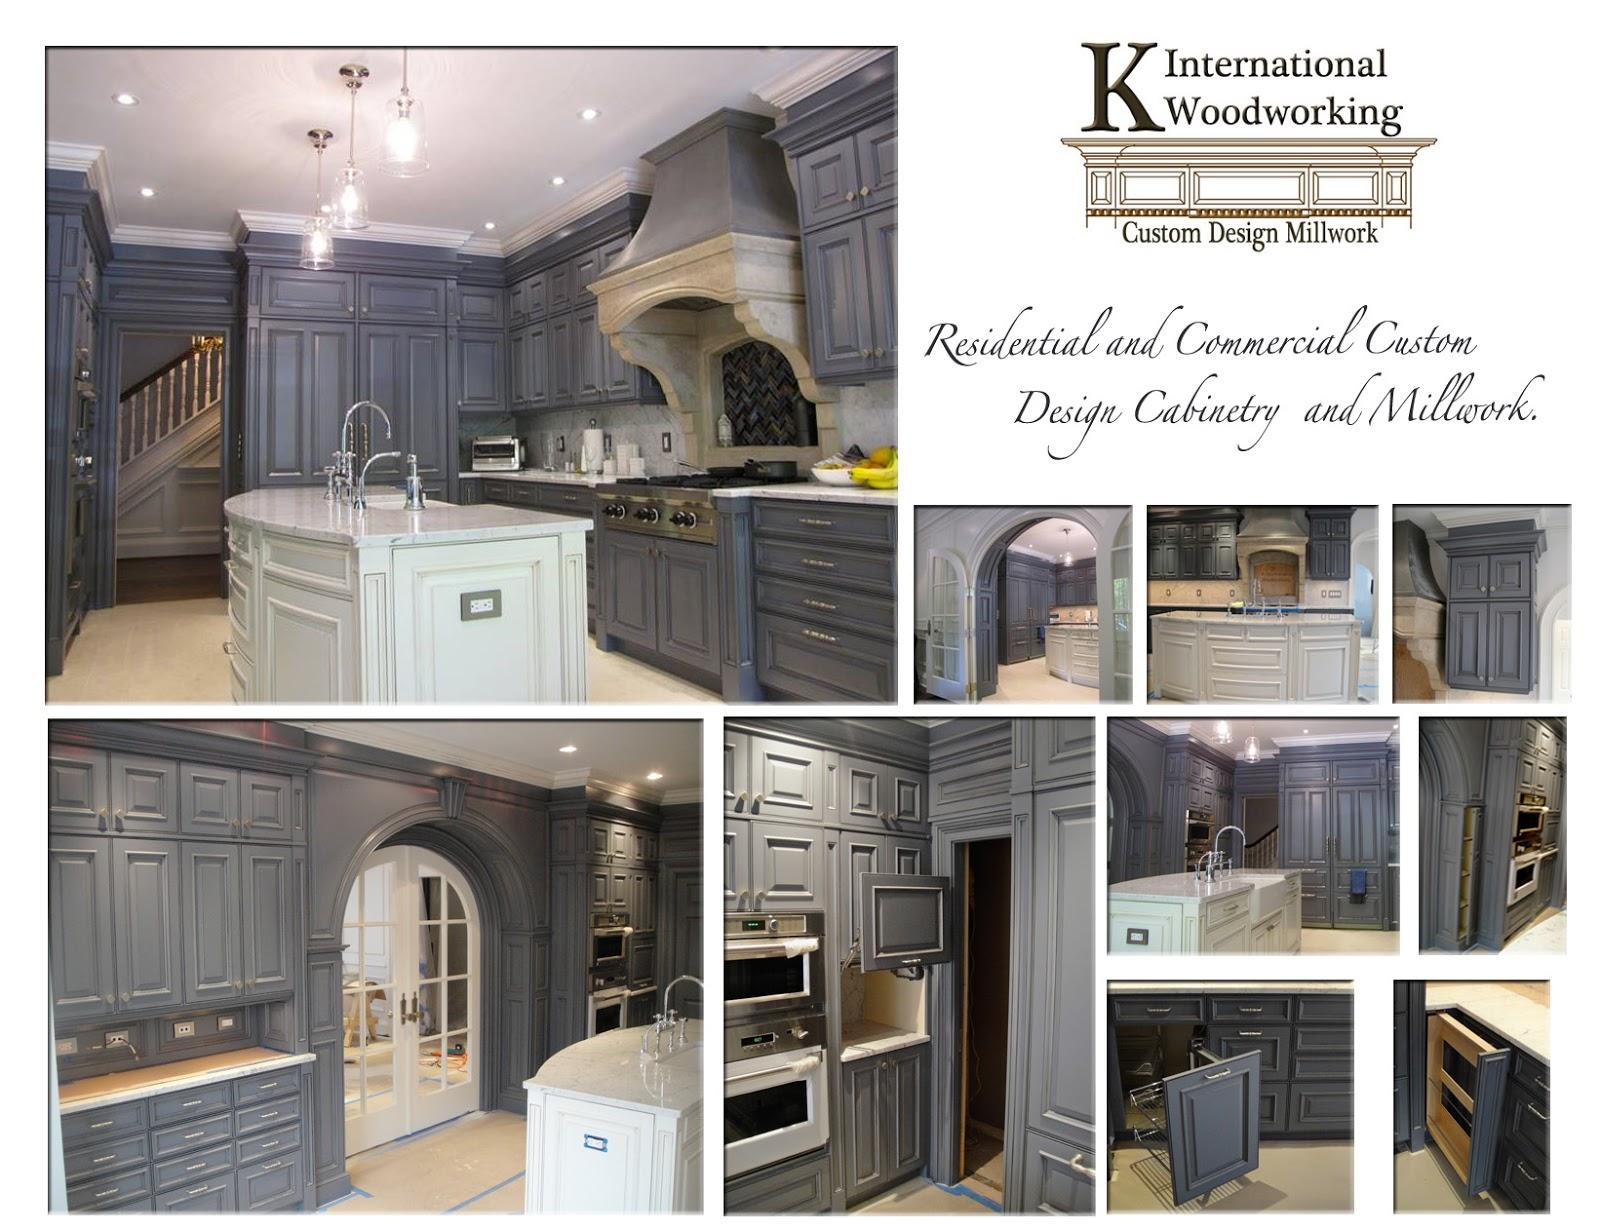 Custom Design Cabinetry Norwood ~ Trip to washington dc k international woodworking